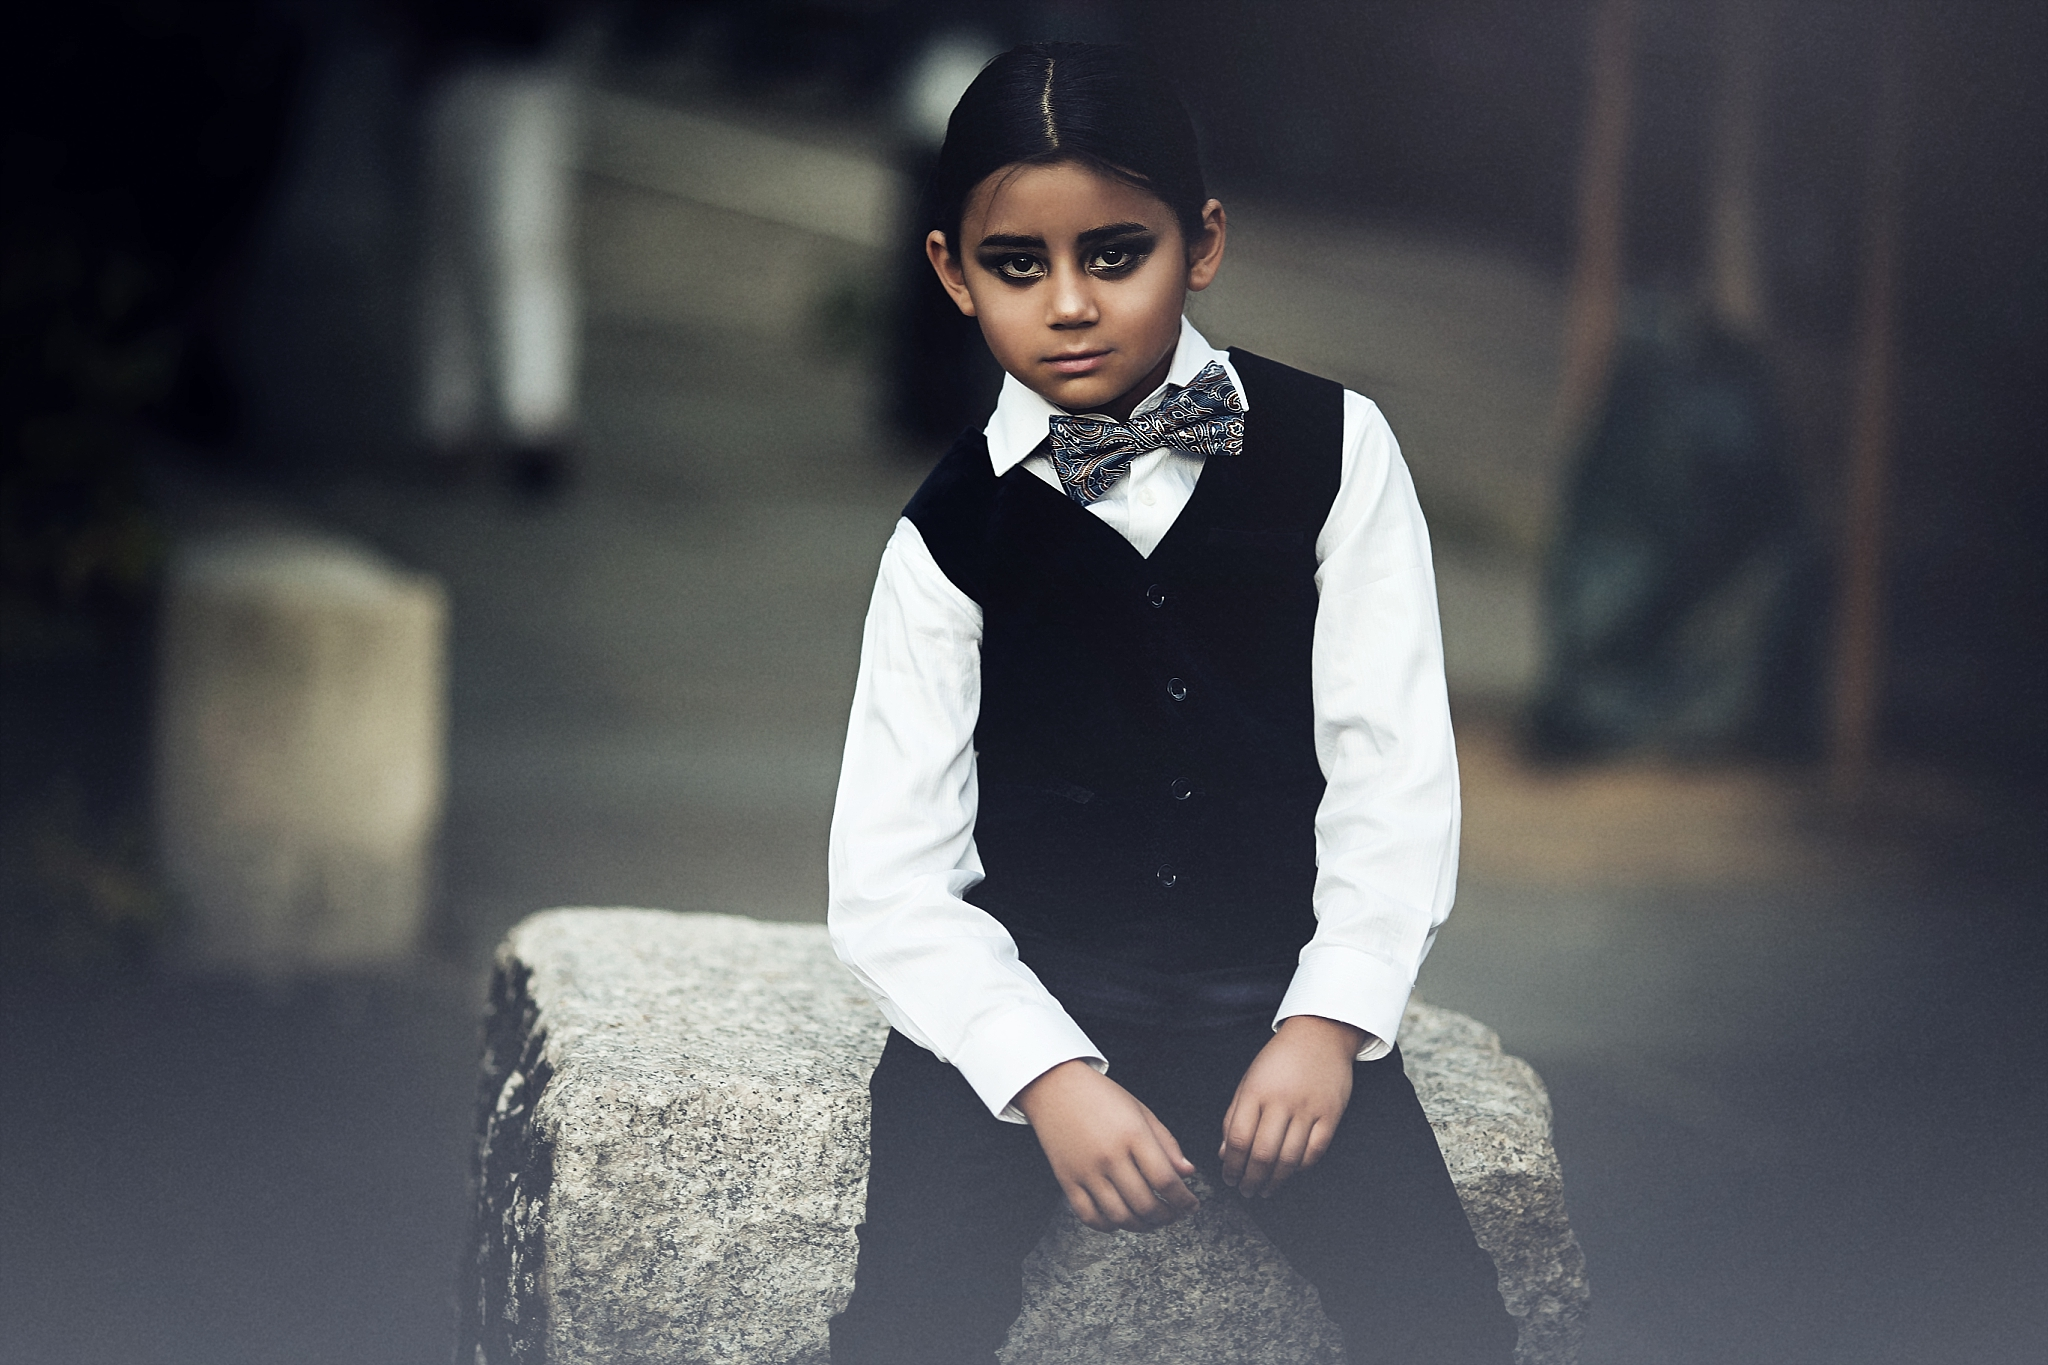 houston child model